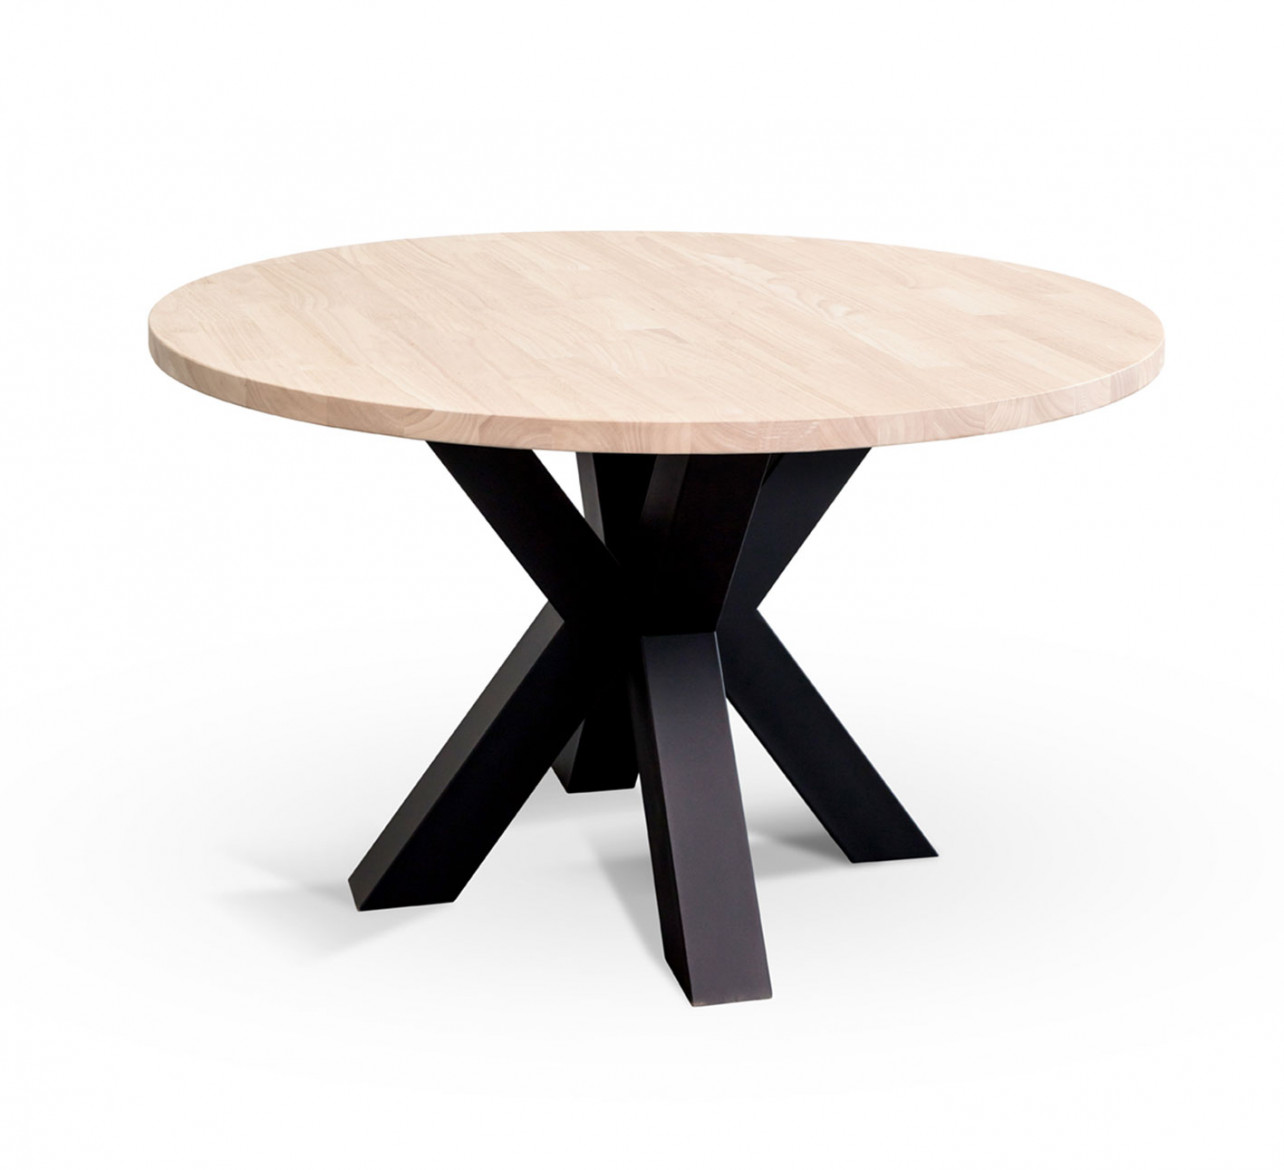 justine-zwart-rubberwood-cropped.jpg